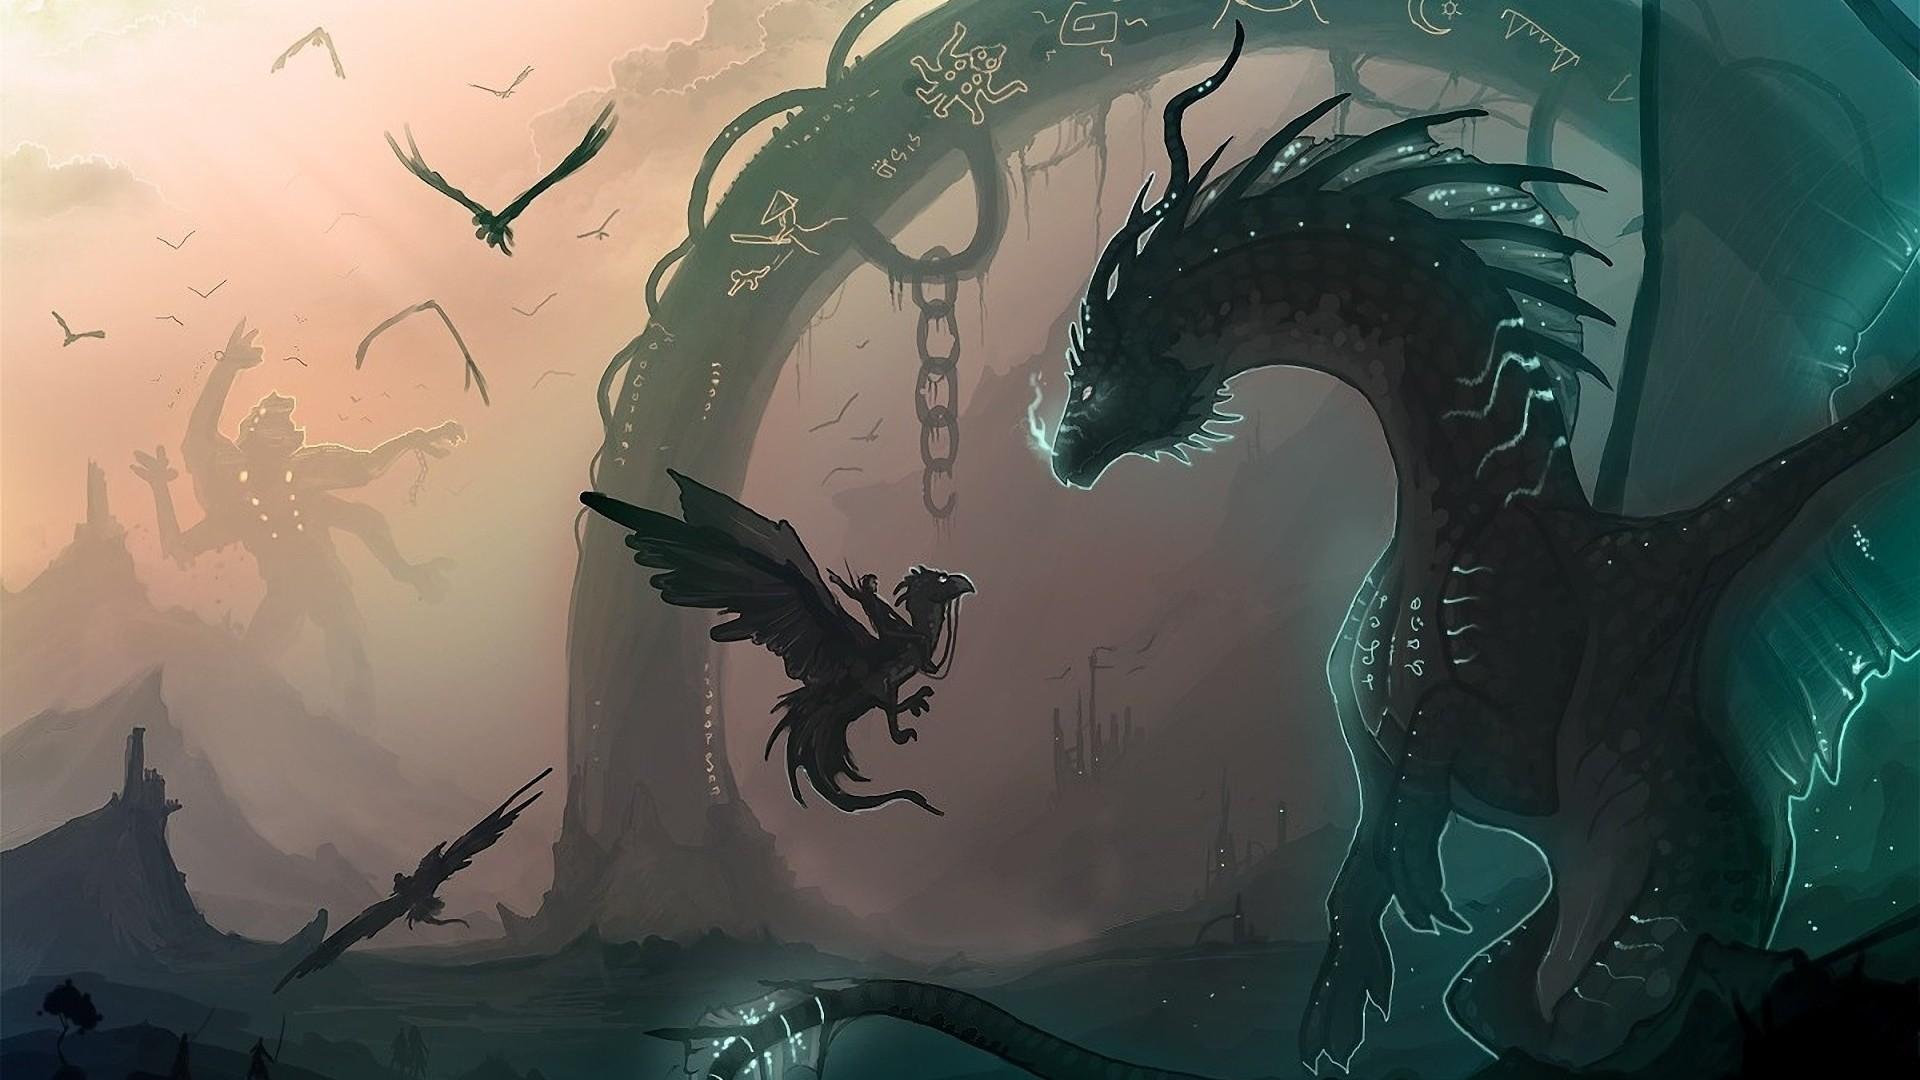 Res: 1920x1080, Dragon Fantasy Anime Wallpaper Wallpaper